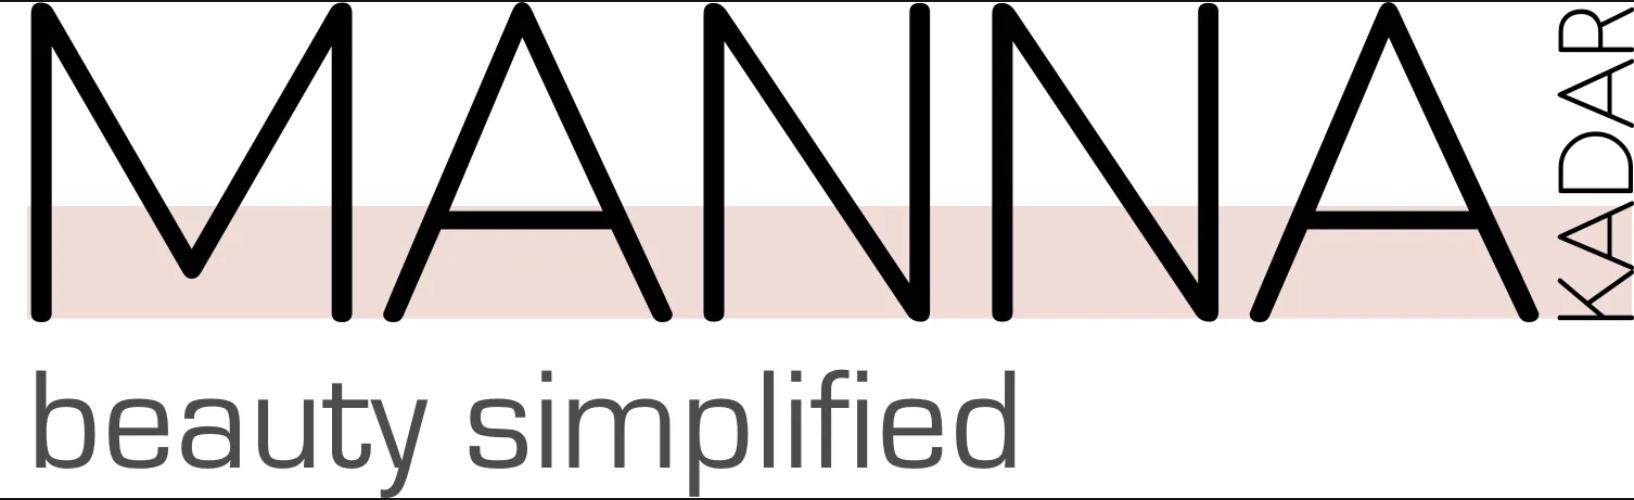 Manna Kadar Beauty Simplified - Debbie Savage